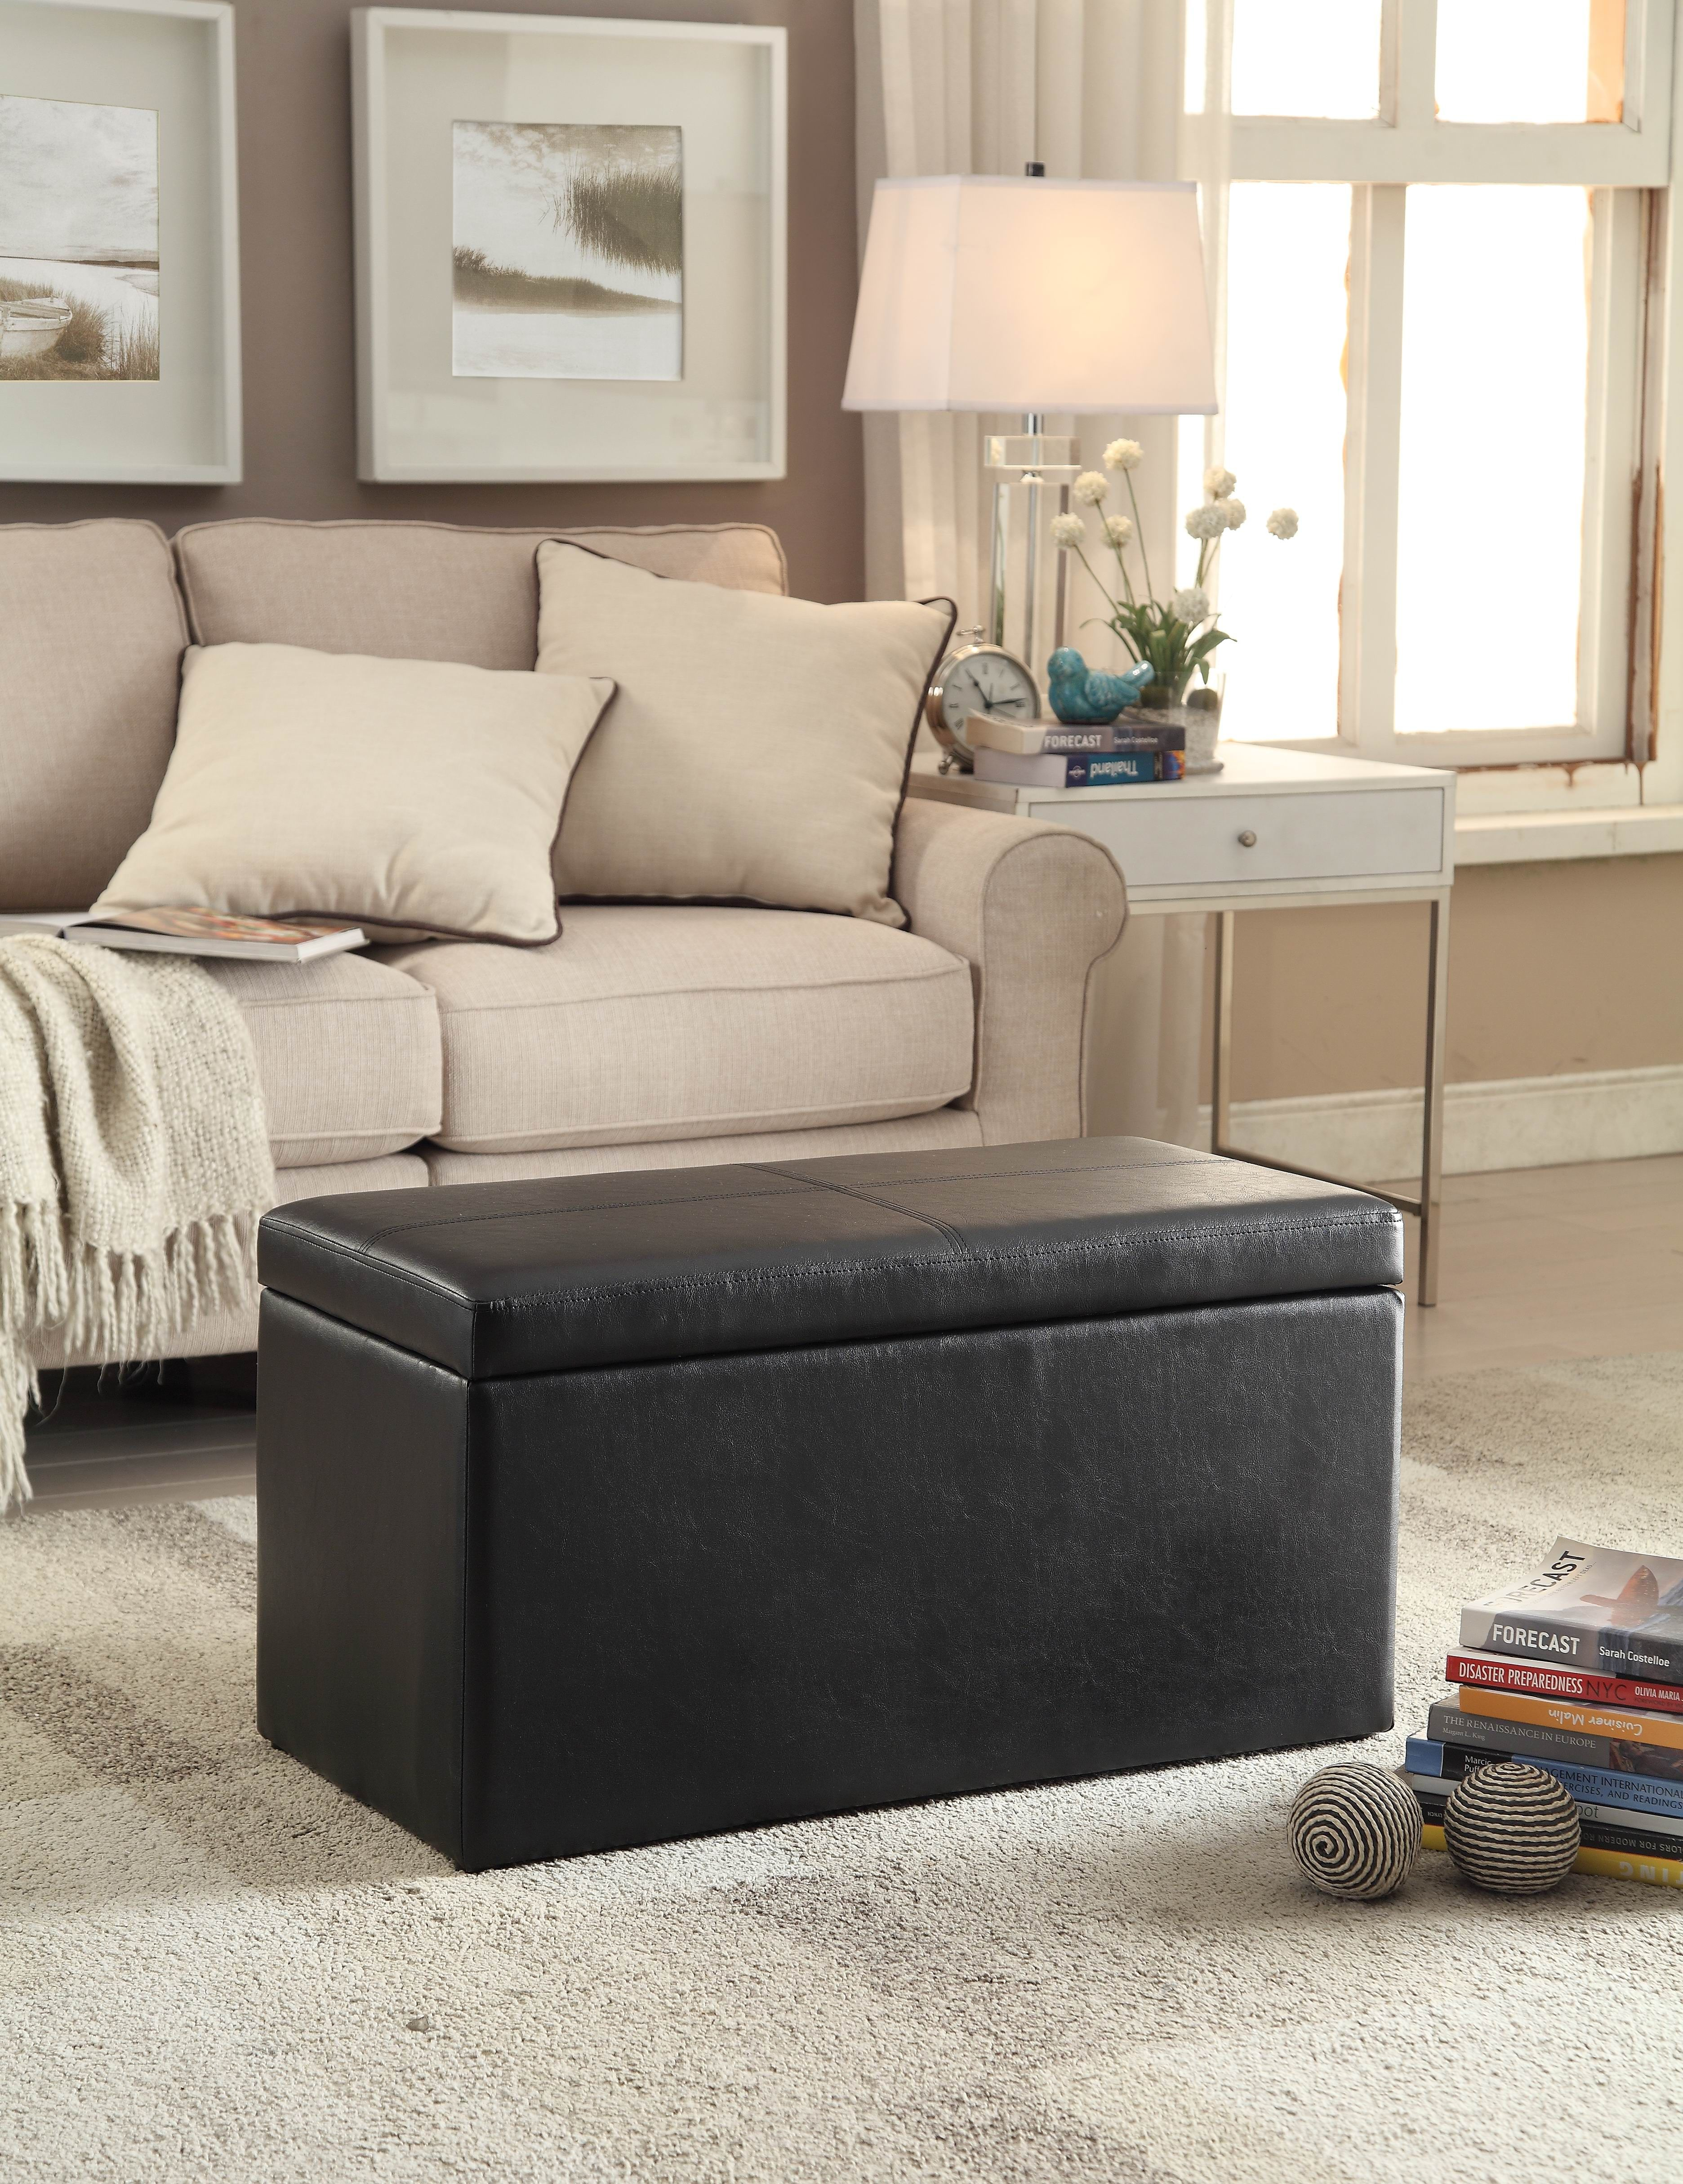 Astonishing Buy 30 Inch Hinged Storage Ottoman Black At Walmart Com Andrewgaddart Wooden Chair Designs For Living Room Andrewgaddartcom